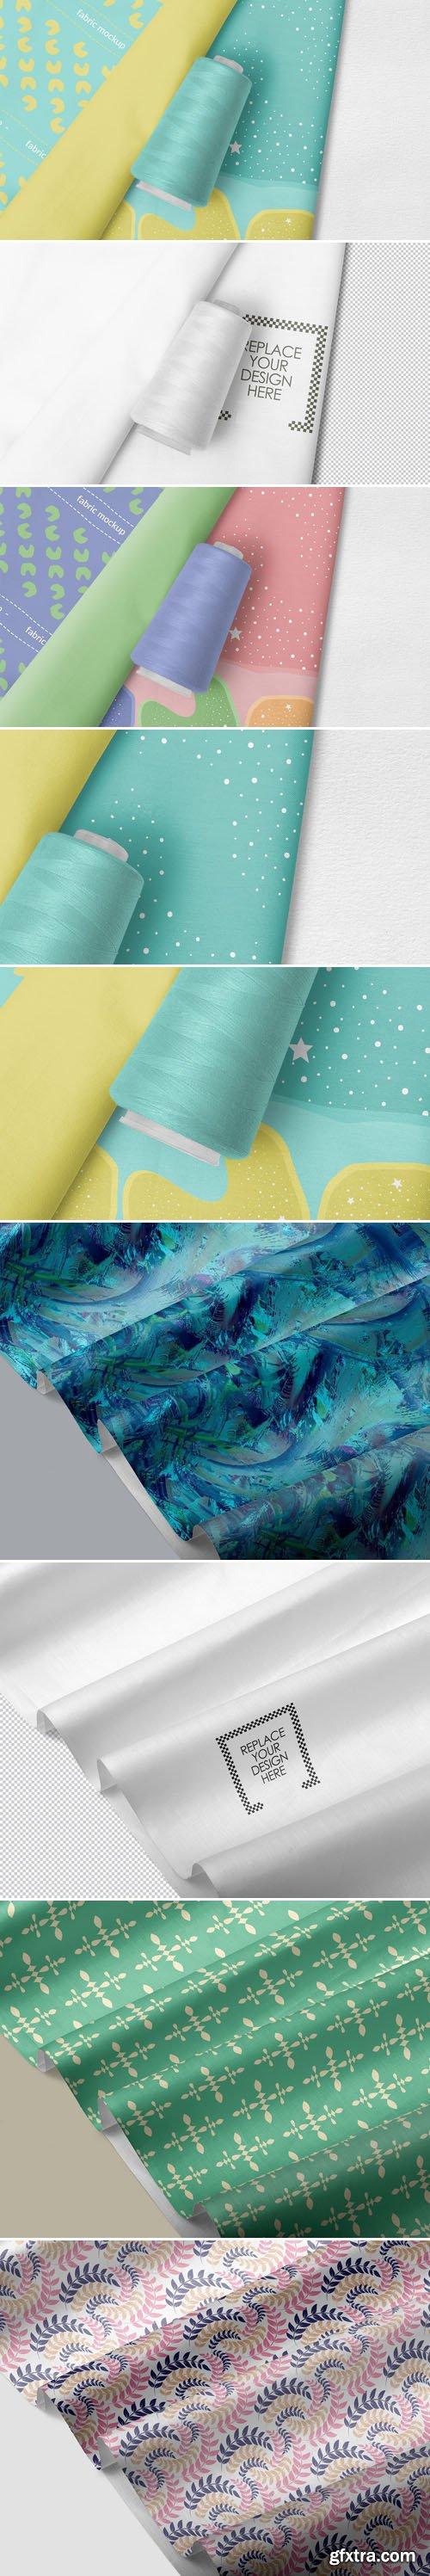 Photorealistic Fabric PSD Mockups